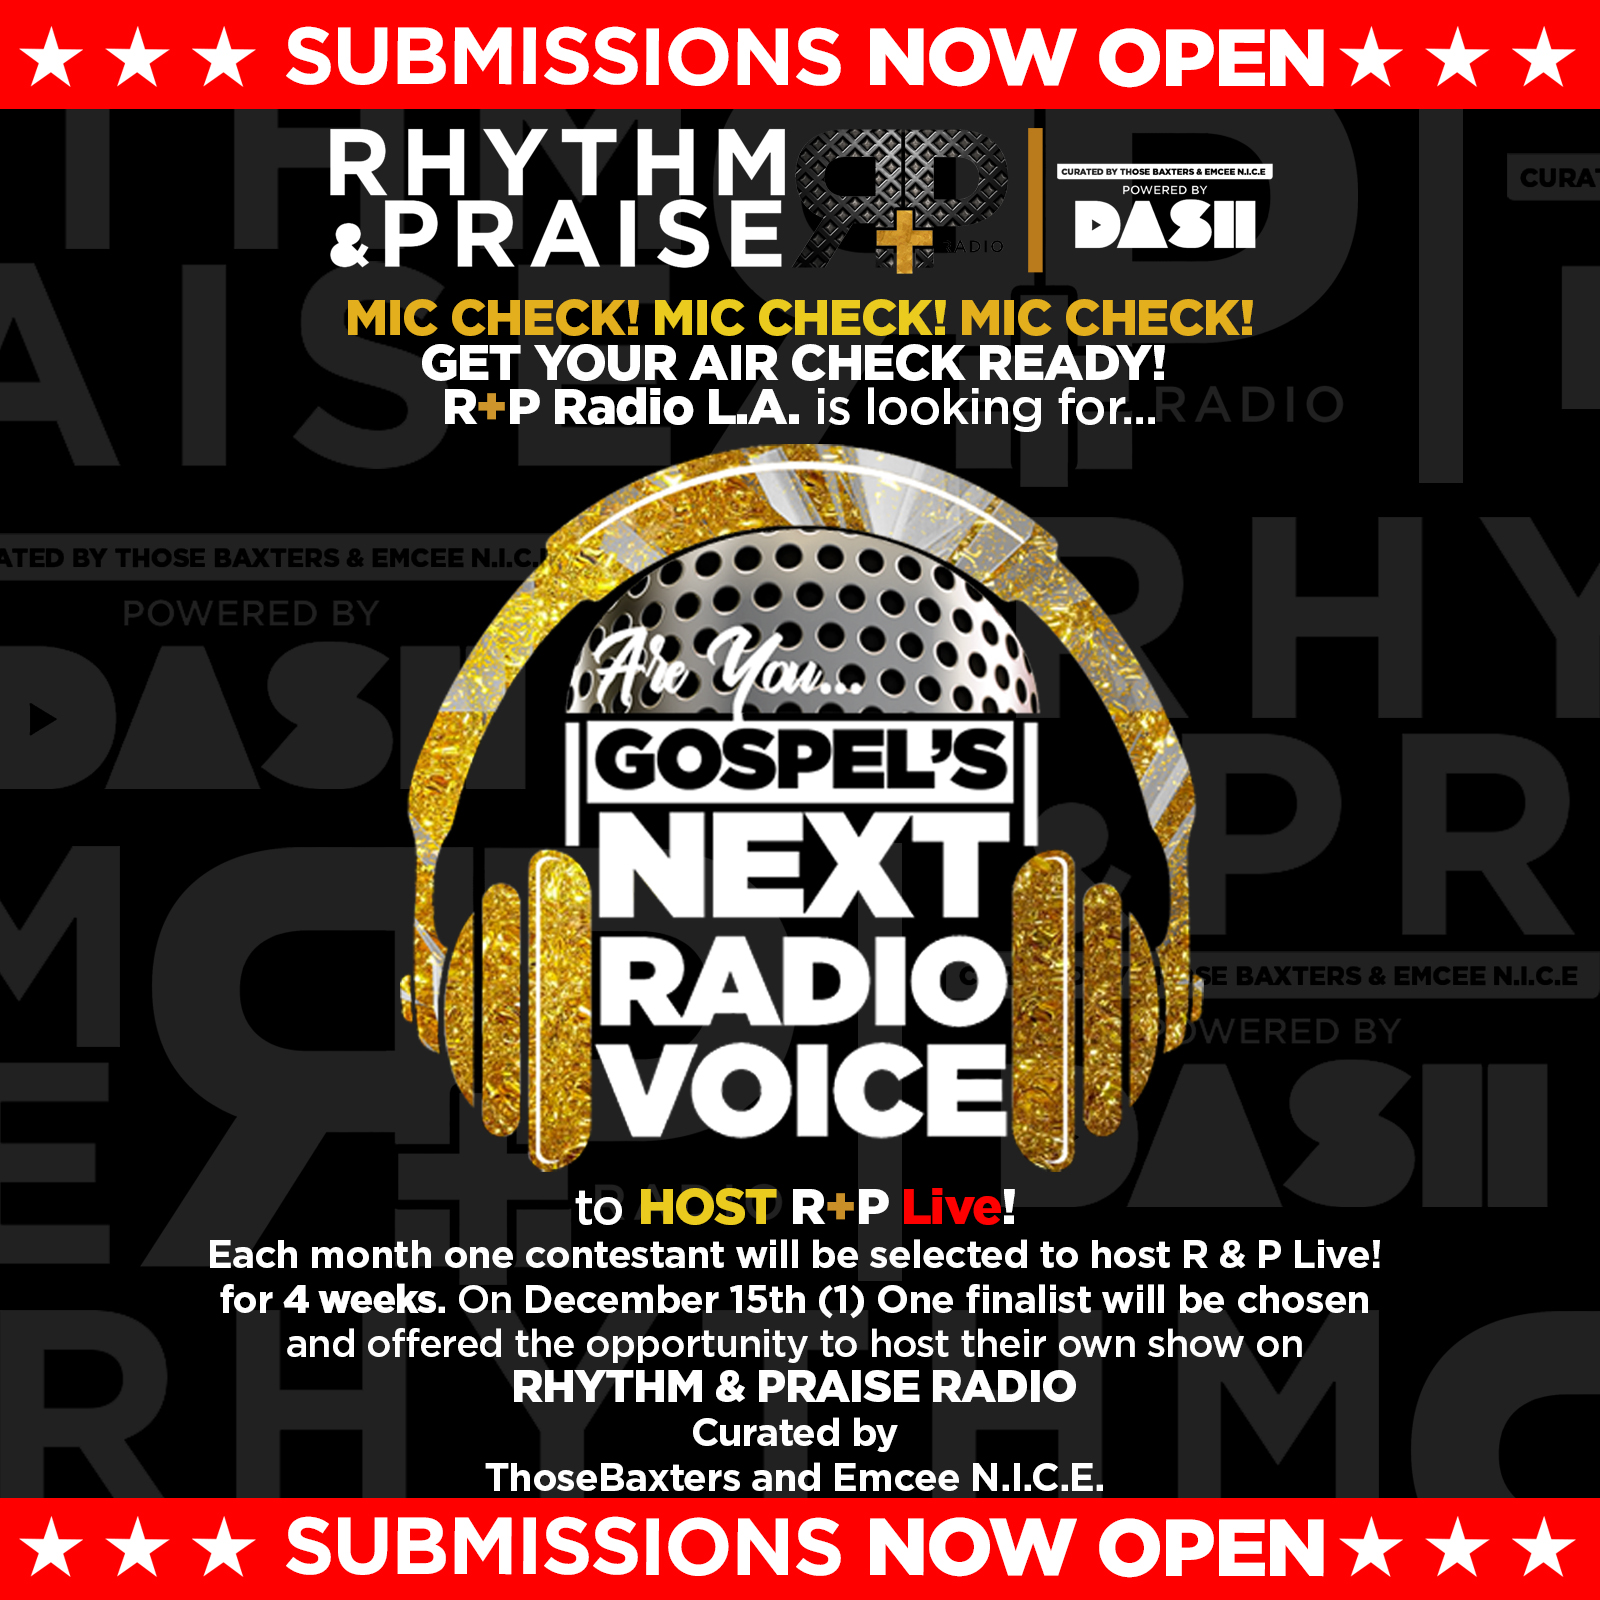 Enter Gospel Next Radio Voice